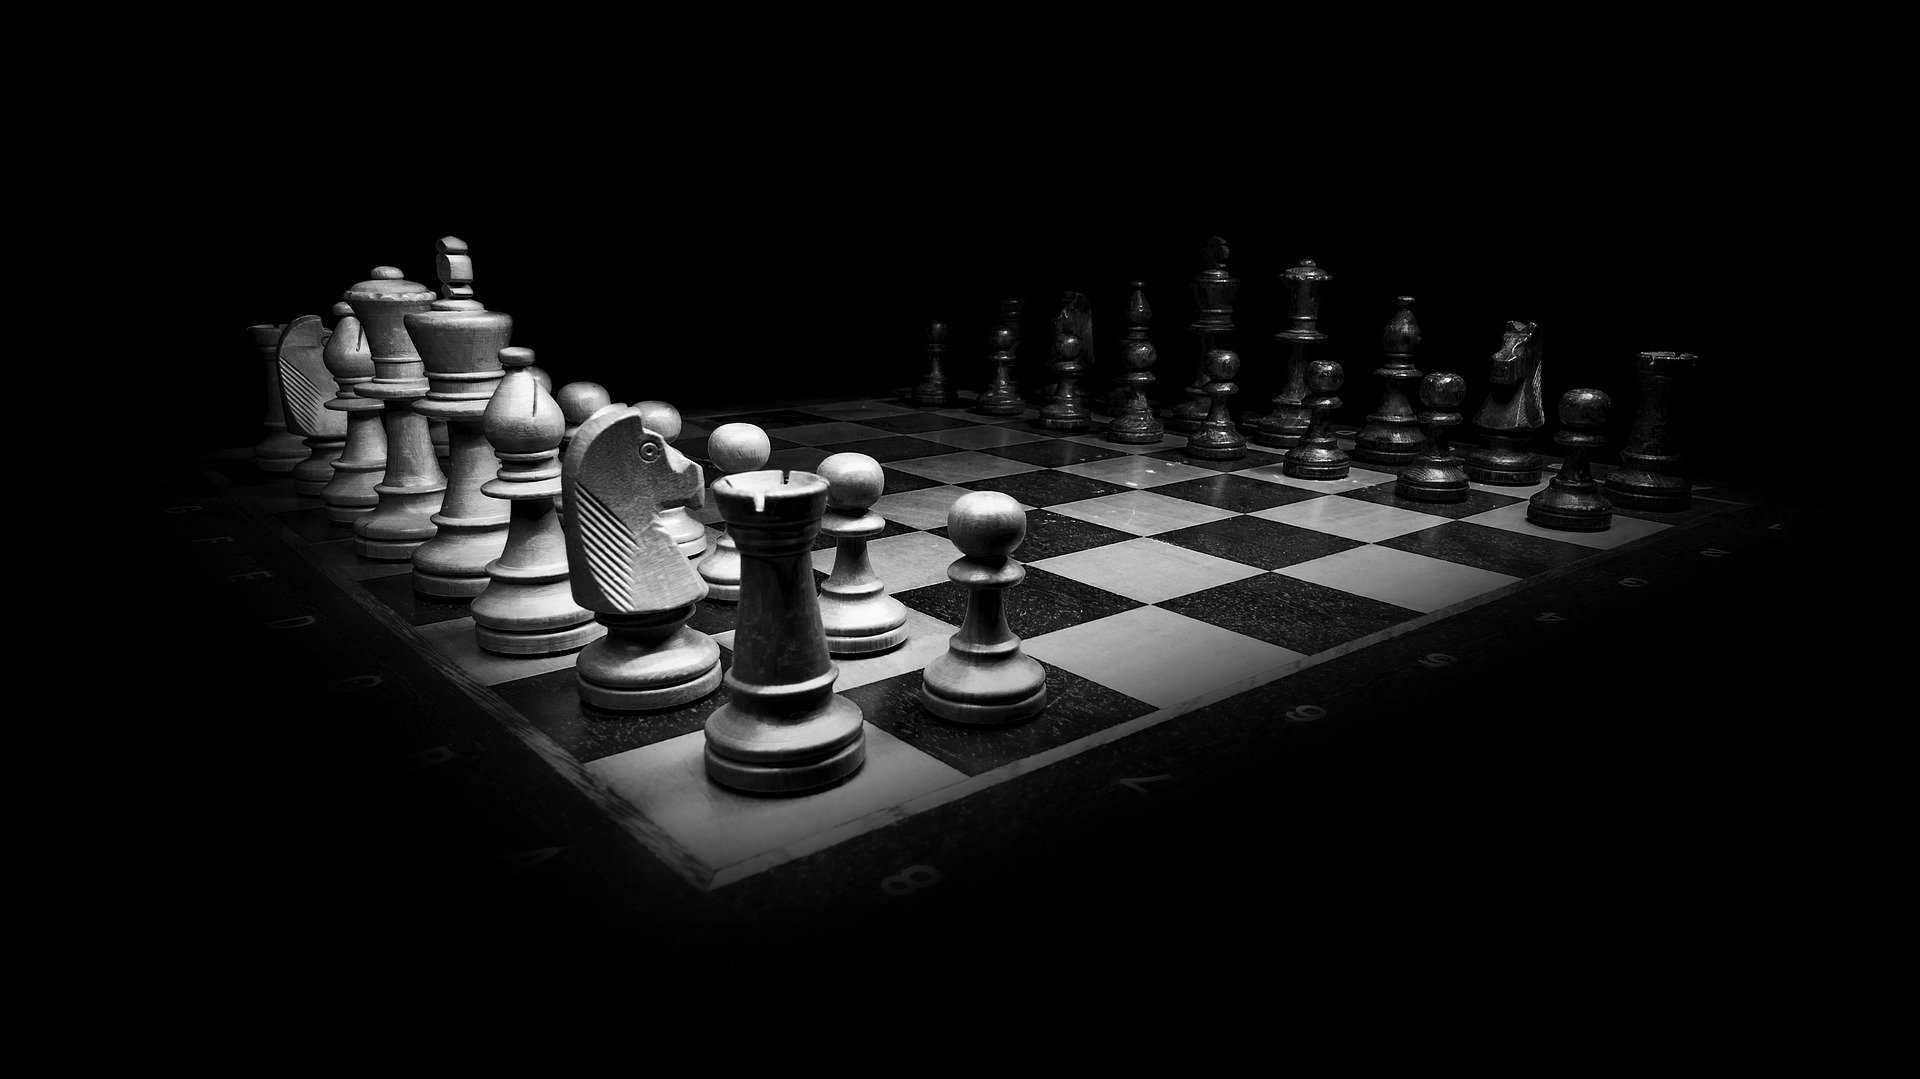 Das ewige Spiel spielen (Rick Boxx) ivcg simon Sinek